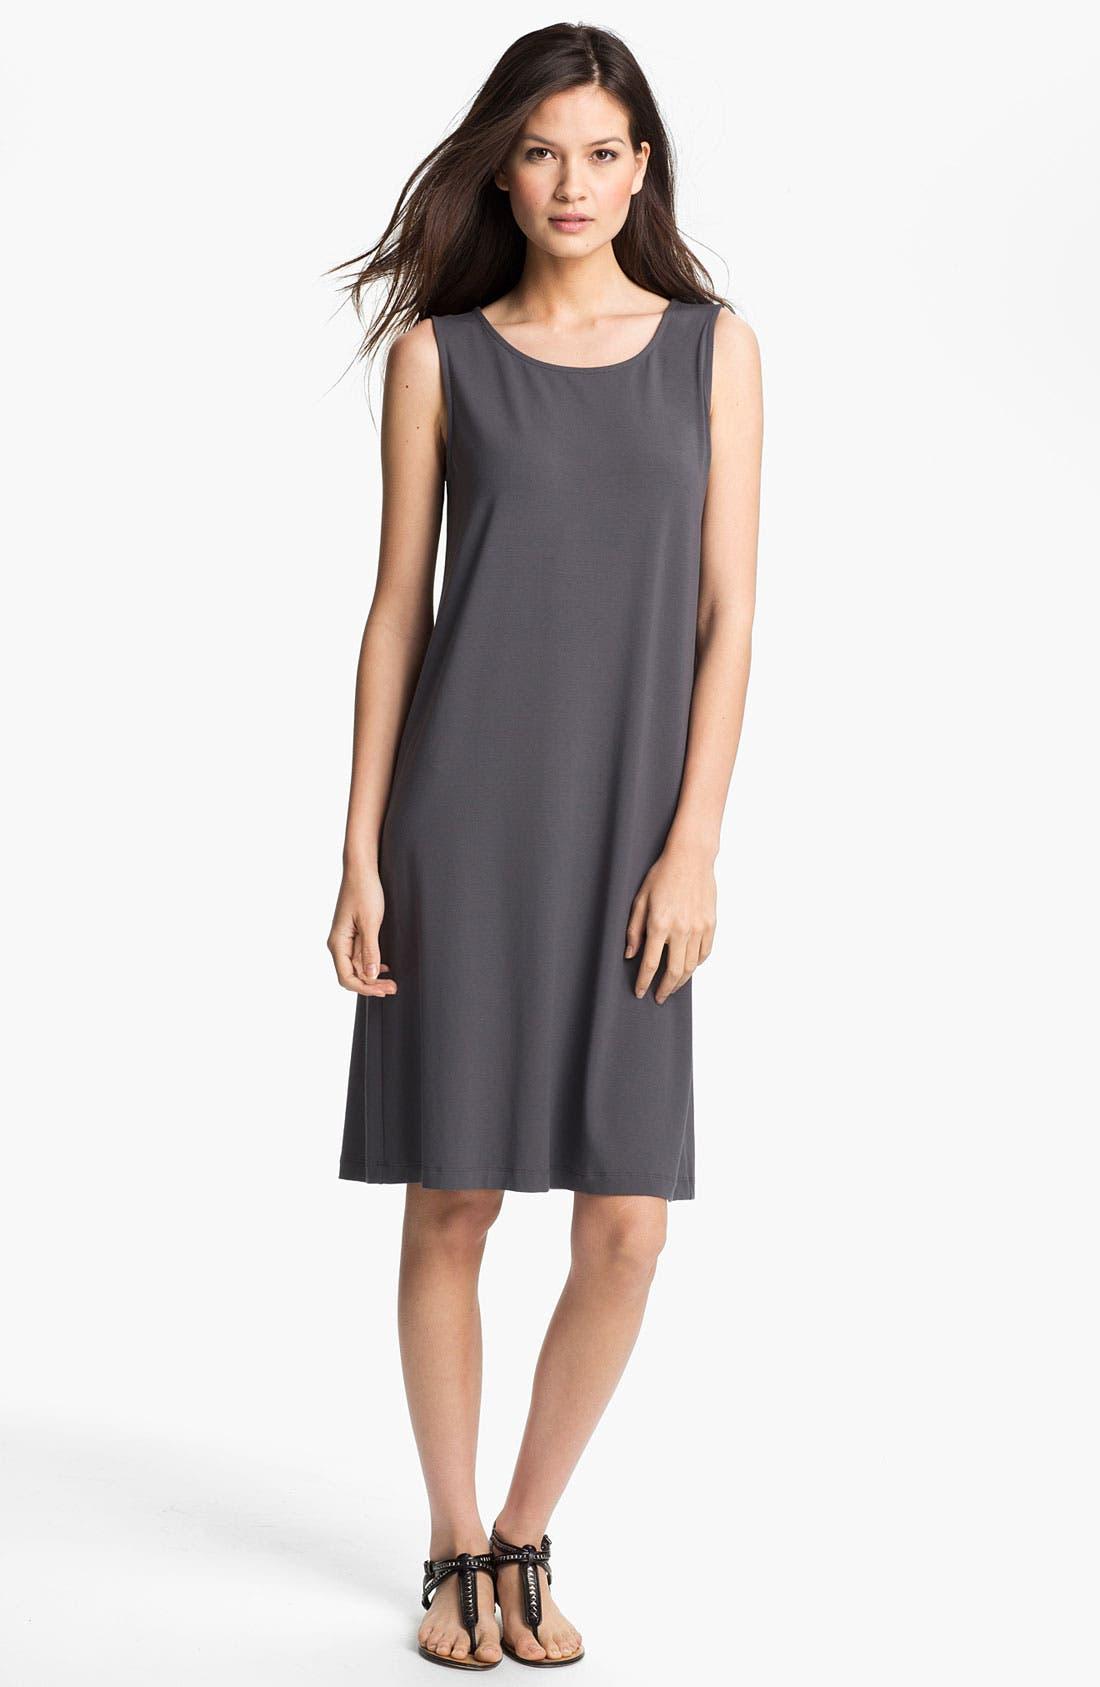 Alternate Image 1 Selected - Eileen Fisher Jewel Neck Shift Dress